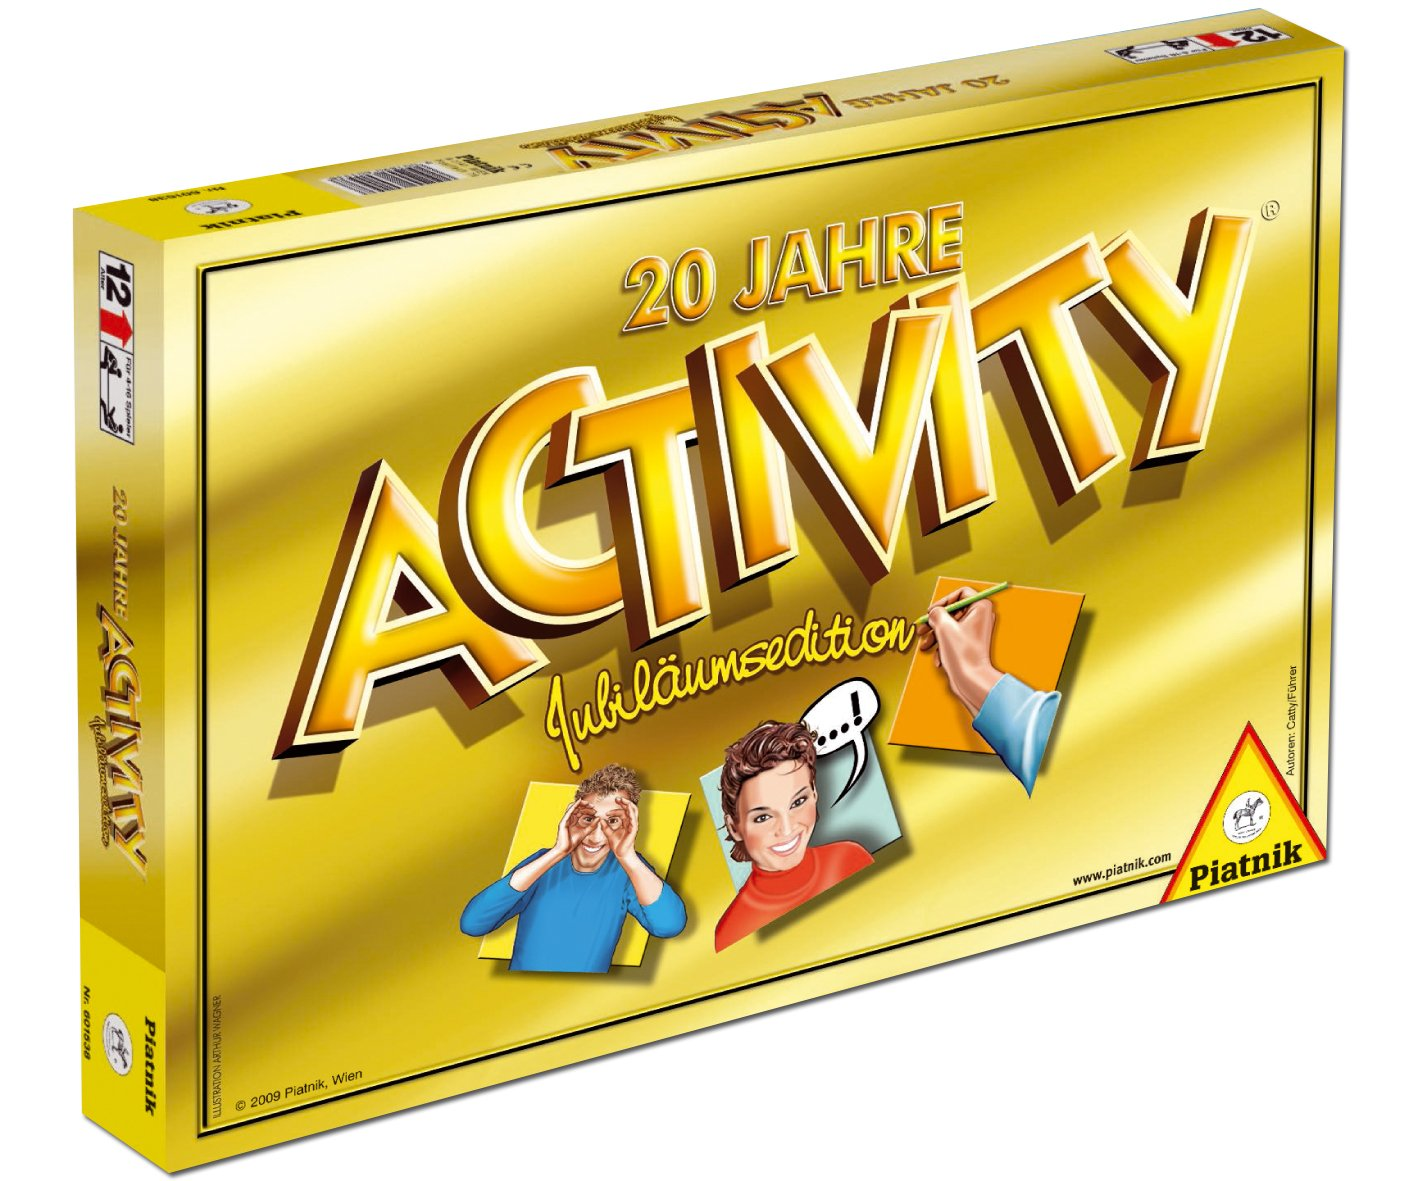 Piatnik 601538 - Jahre 20 Jahre - Activity e9f7ec